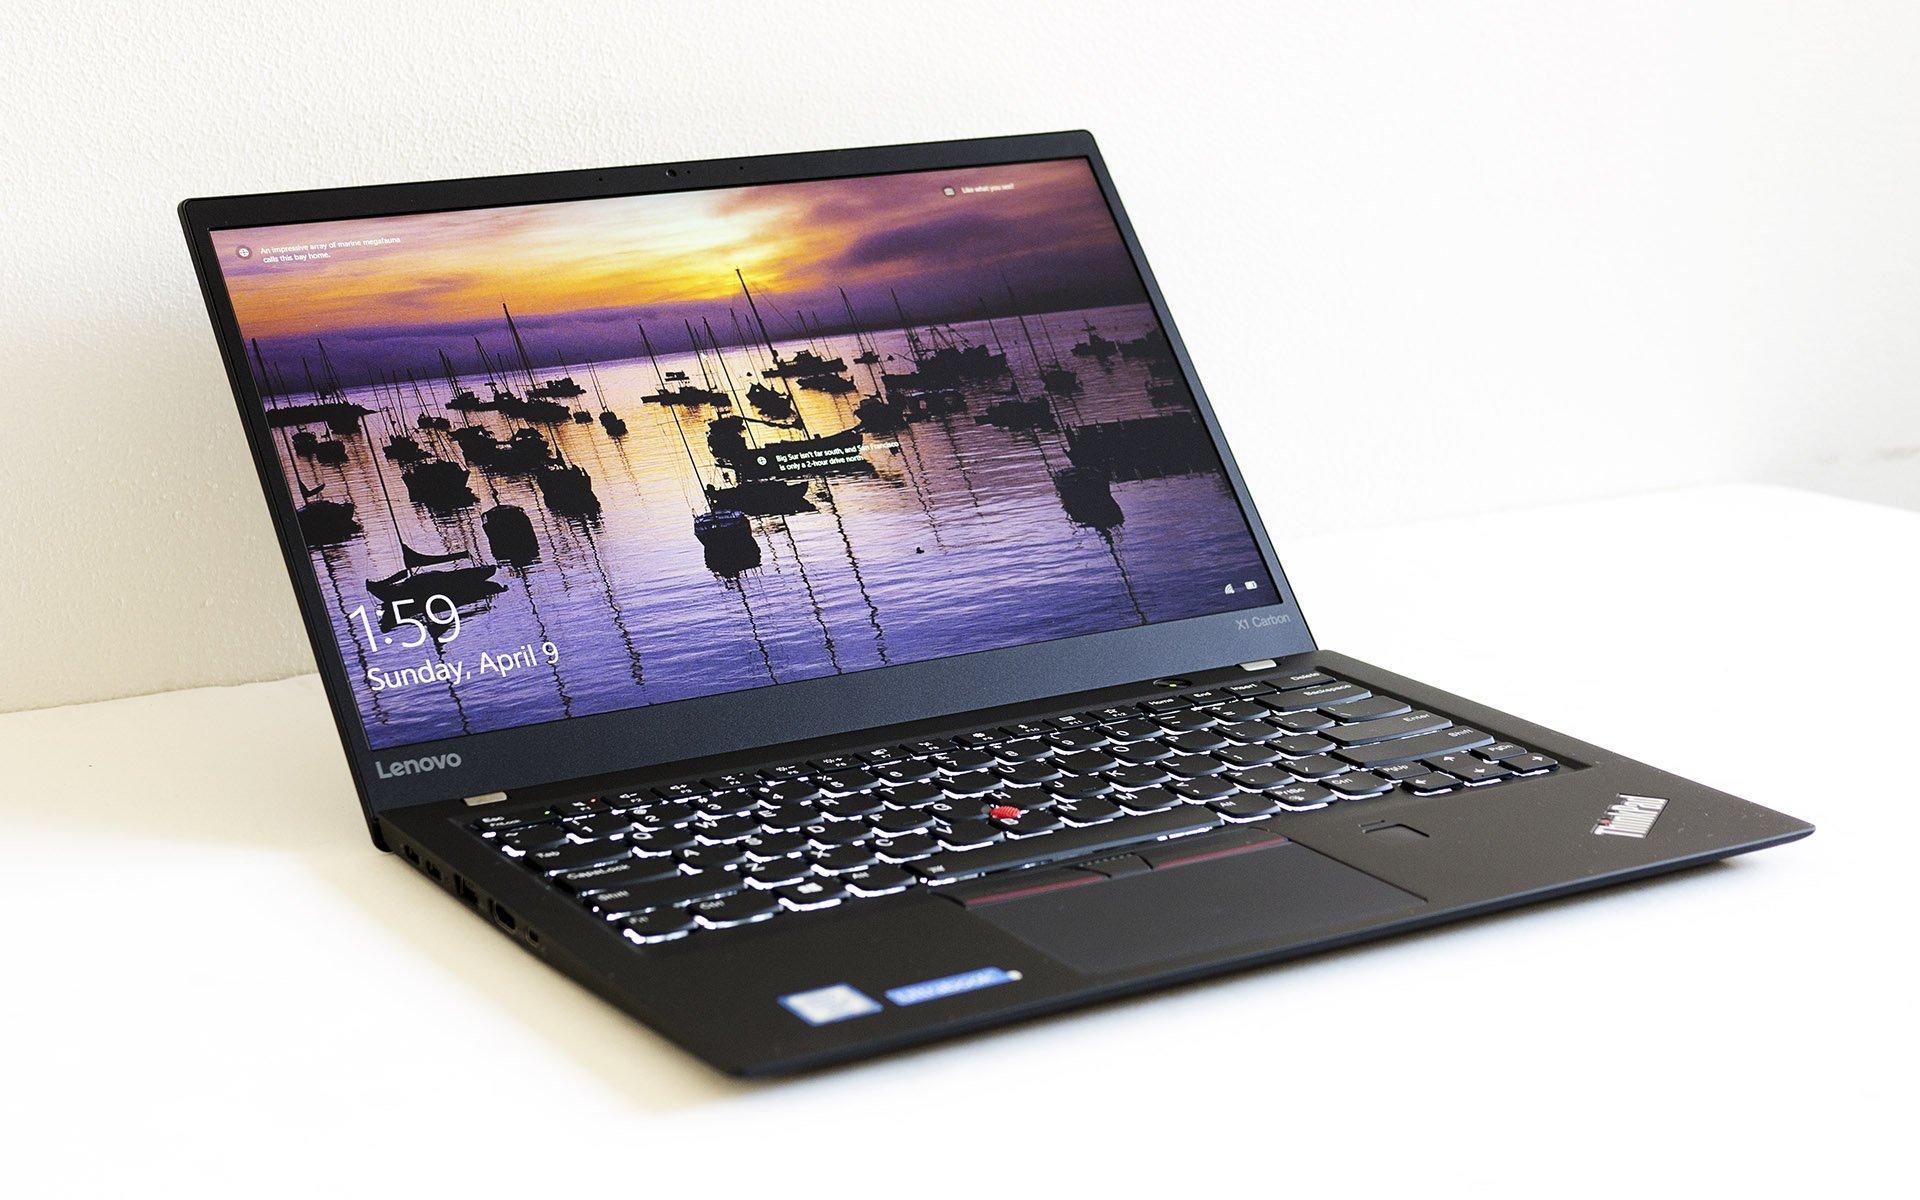 Lenovo представила в РФ новые ноутбуки ThinkPad